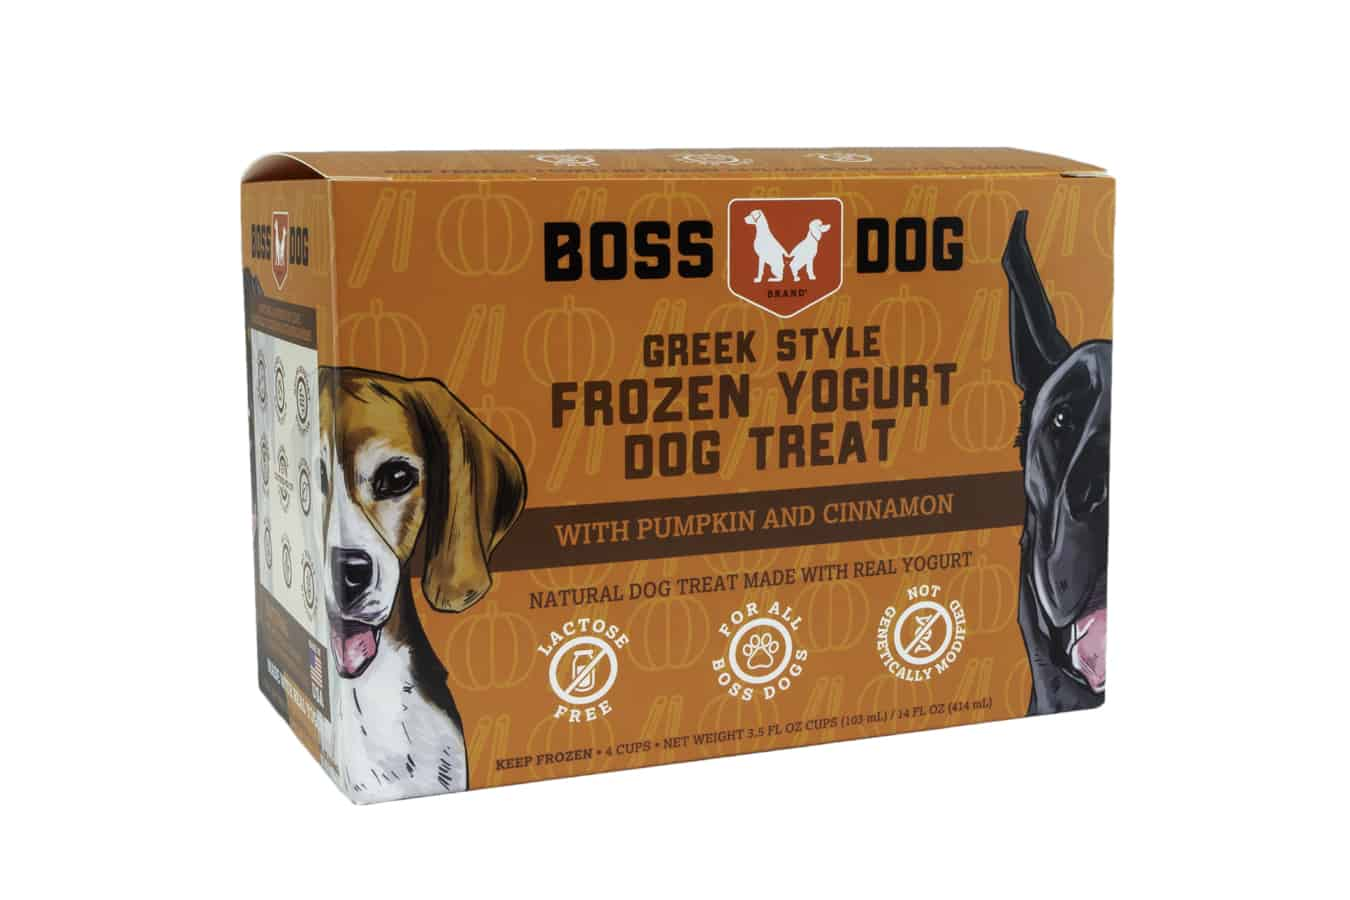 Boss Dog Pumpkin & Cinnamon Frozen Yogurt Dog Treats, 3.5-oz, 4-pack